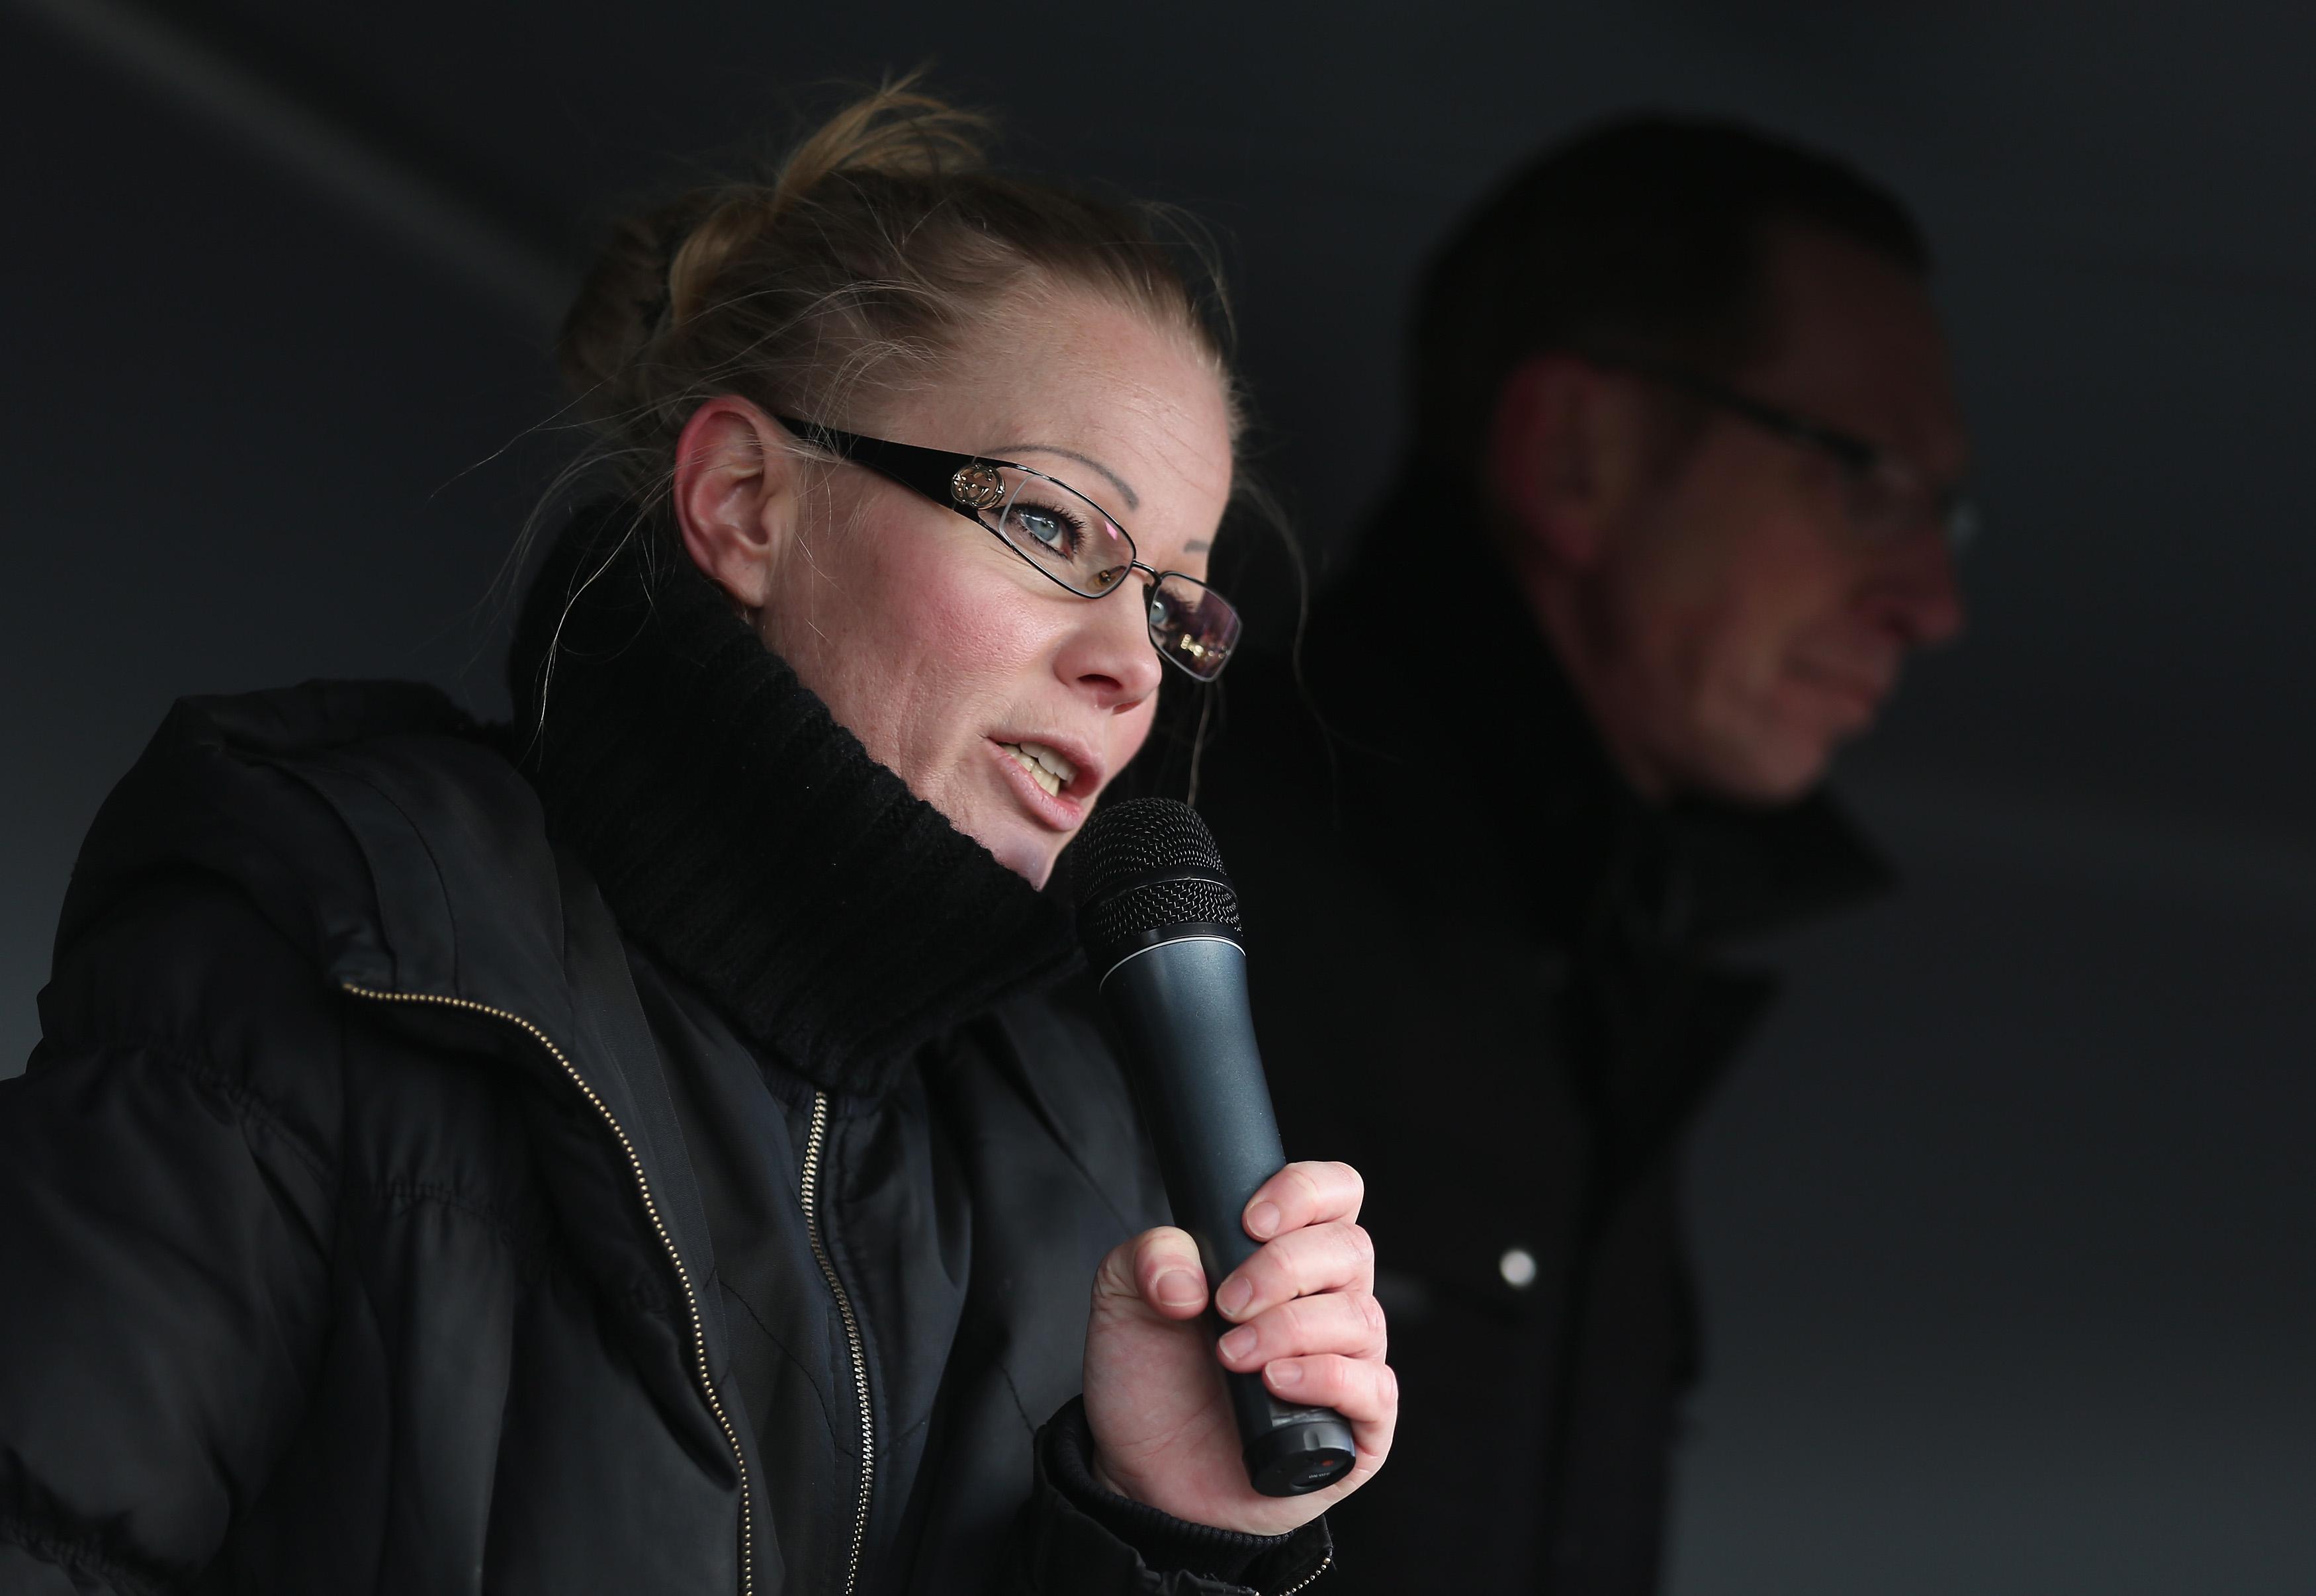 DRESDEN, GERMANY - FEBRUARY 08:  Kathrin Oertel, former spokeswoman for Pegida and now head of the DDfE (Direkte Demokratie f